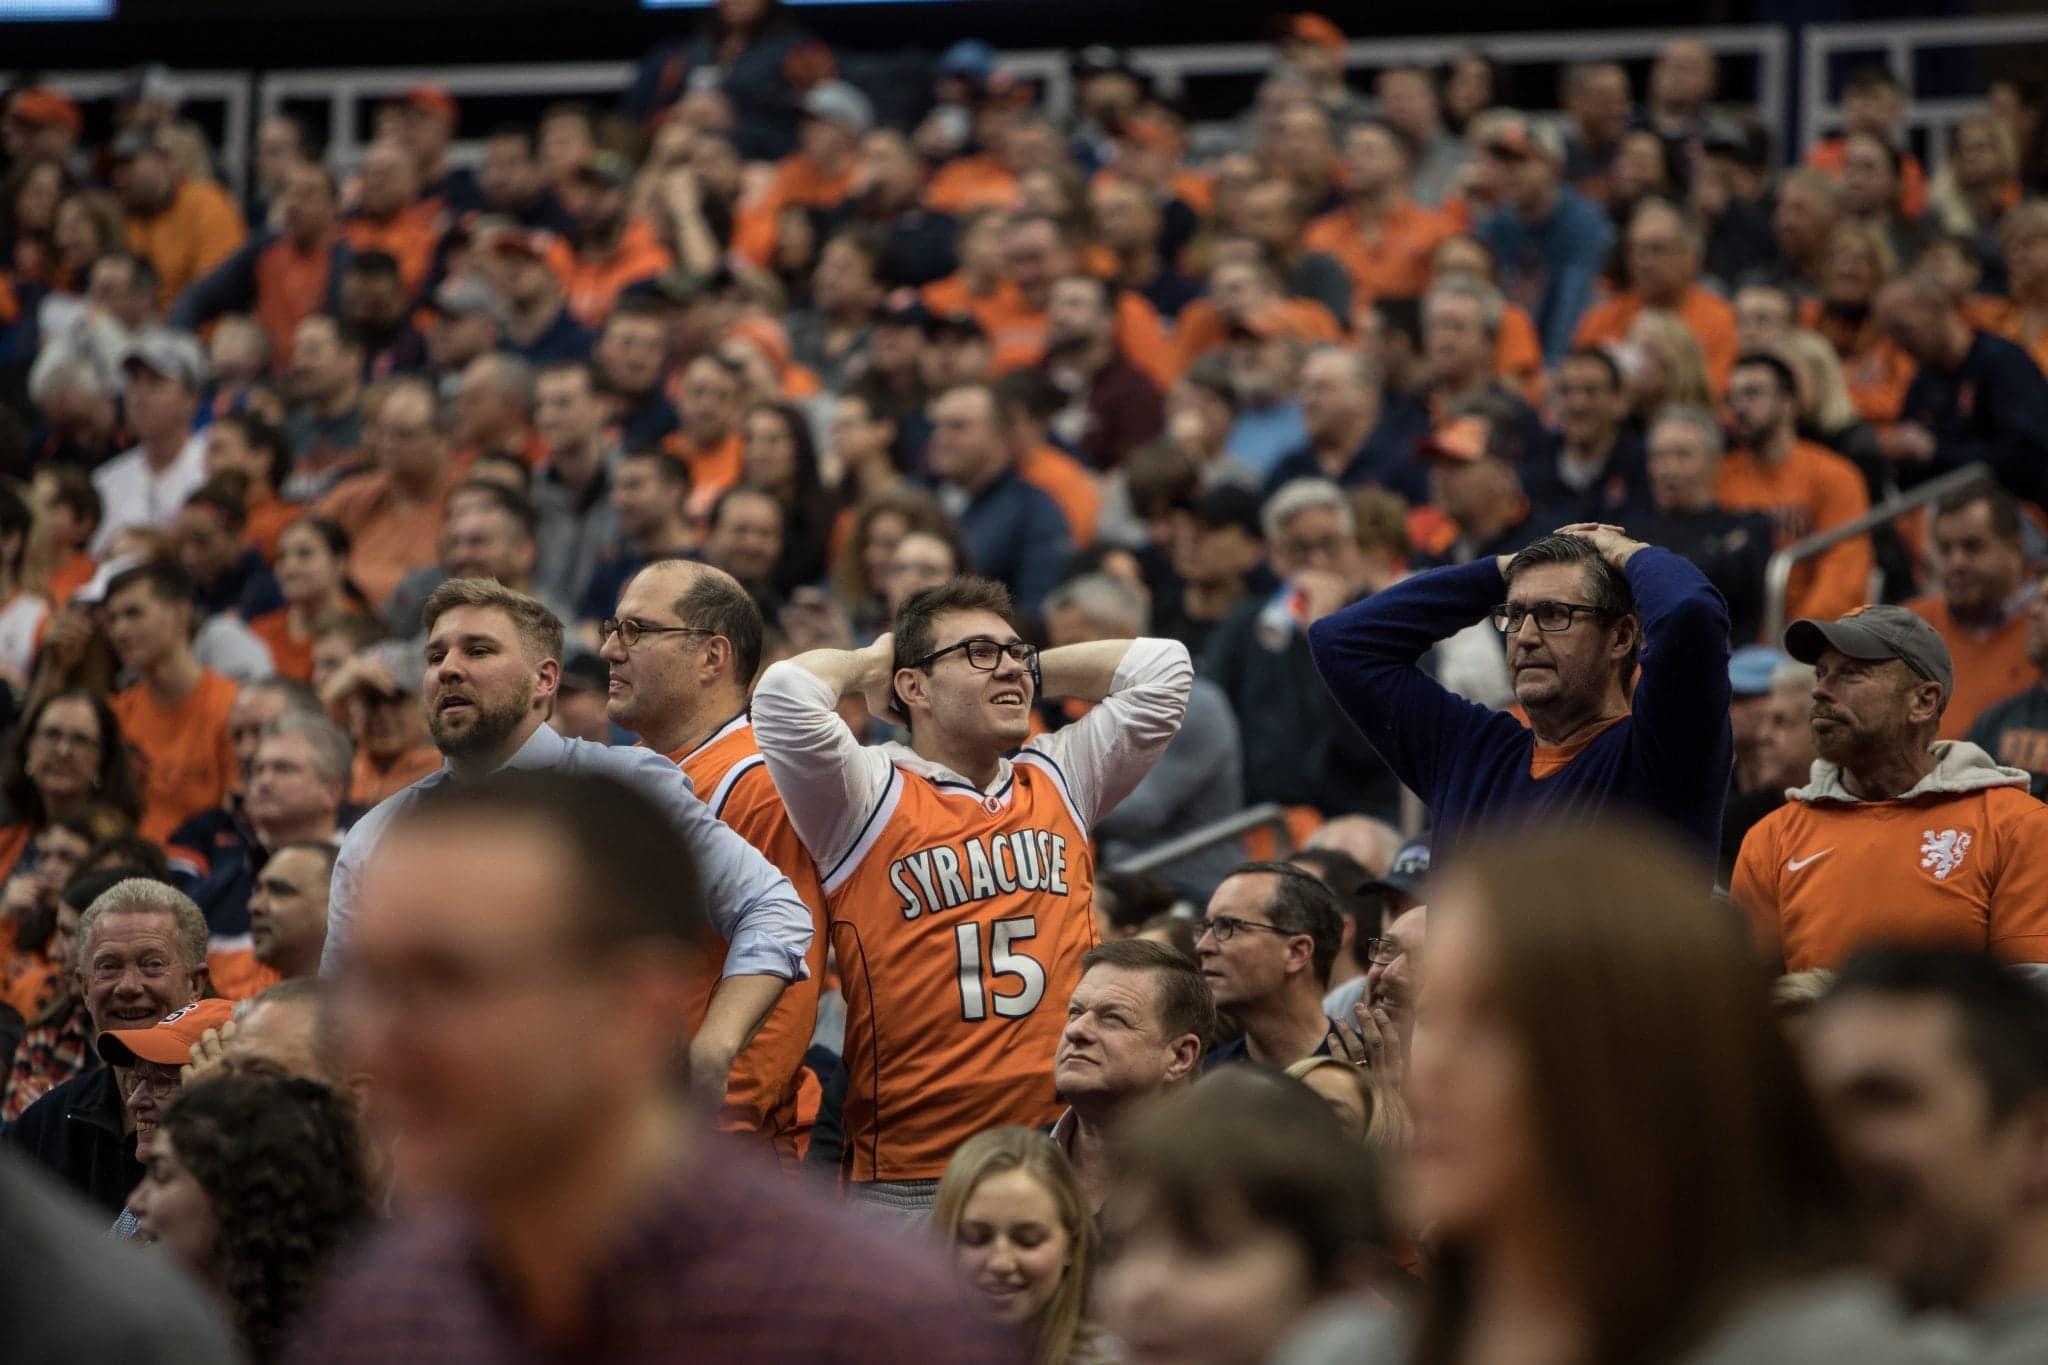 Syracuse men's basketball fans react